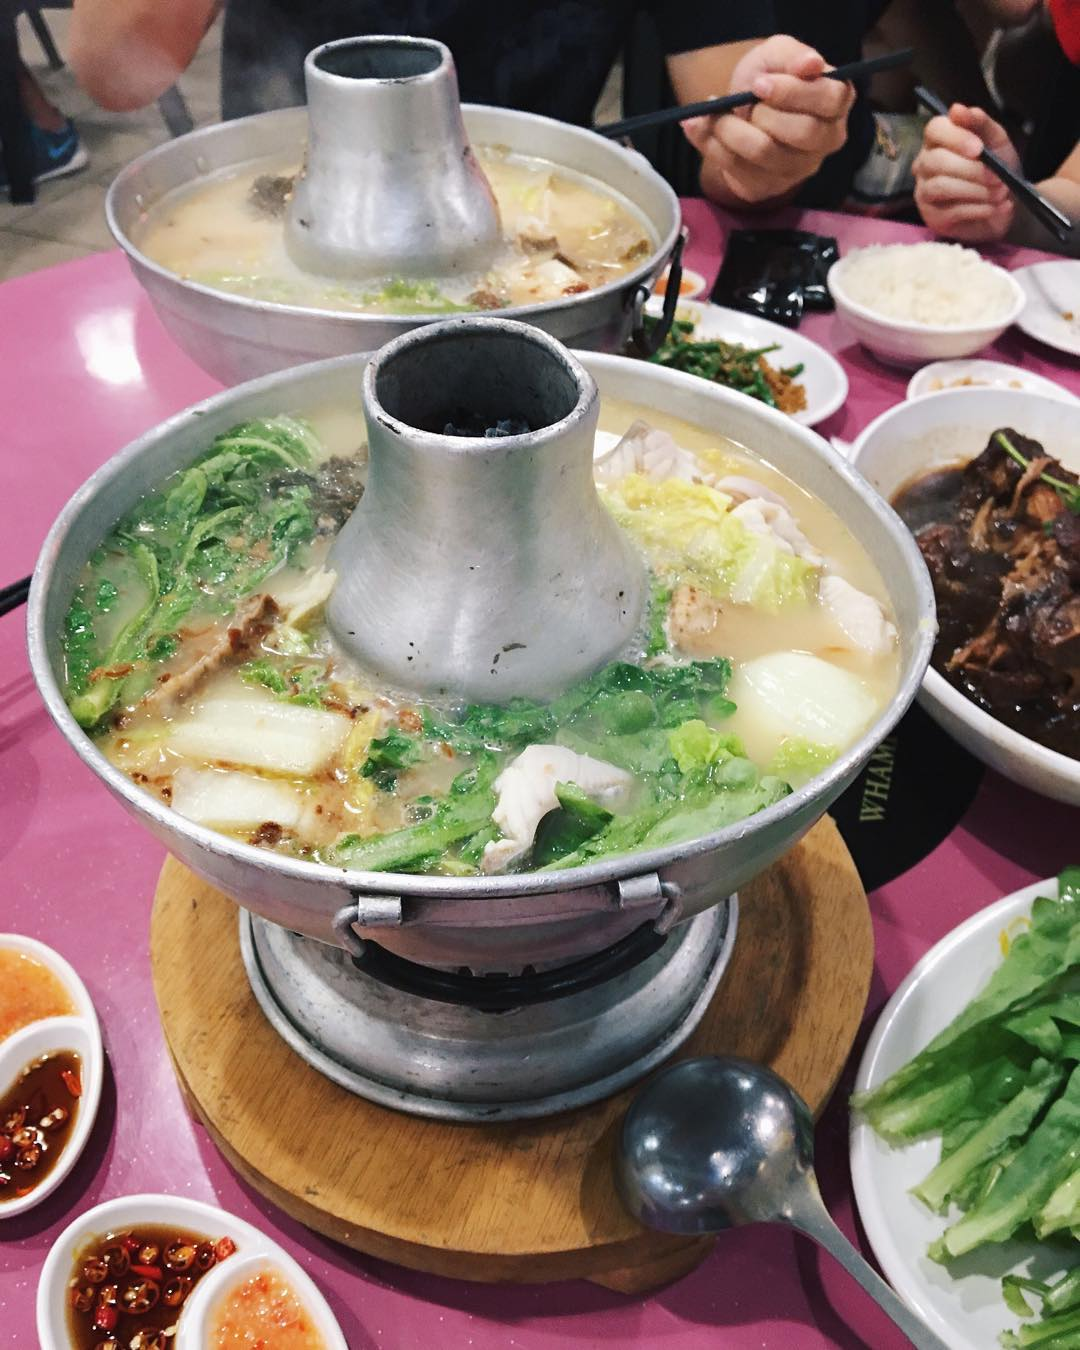 Farrer Park Food - Whampoa Keng Fish Head Steamboat